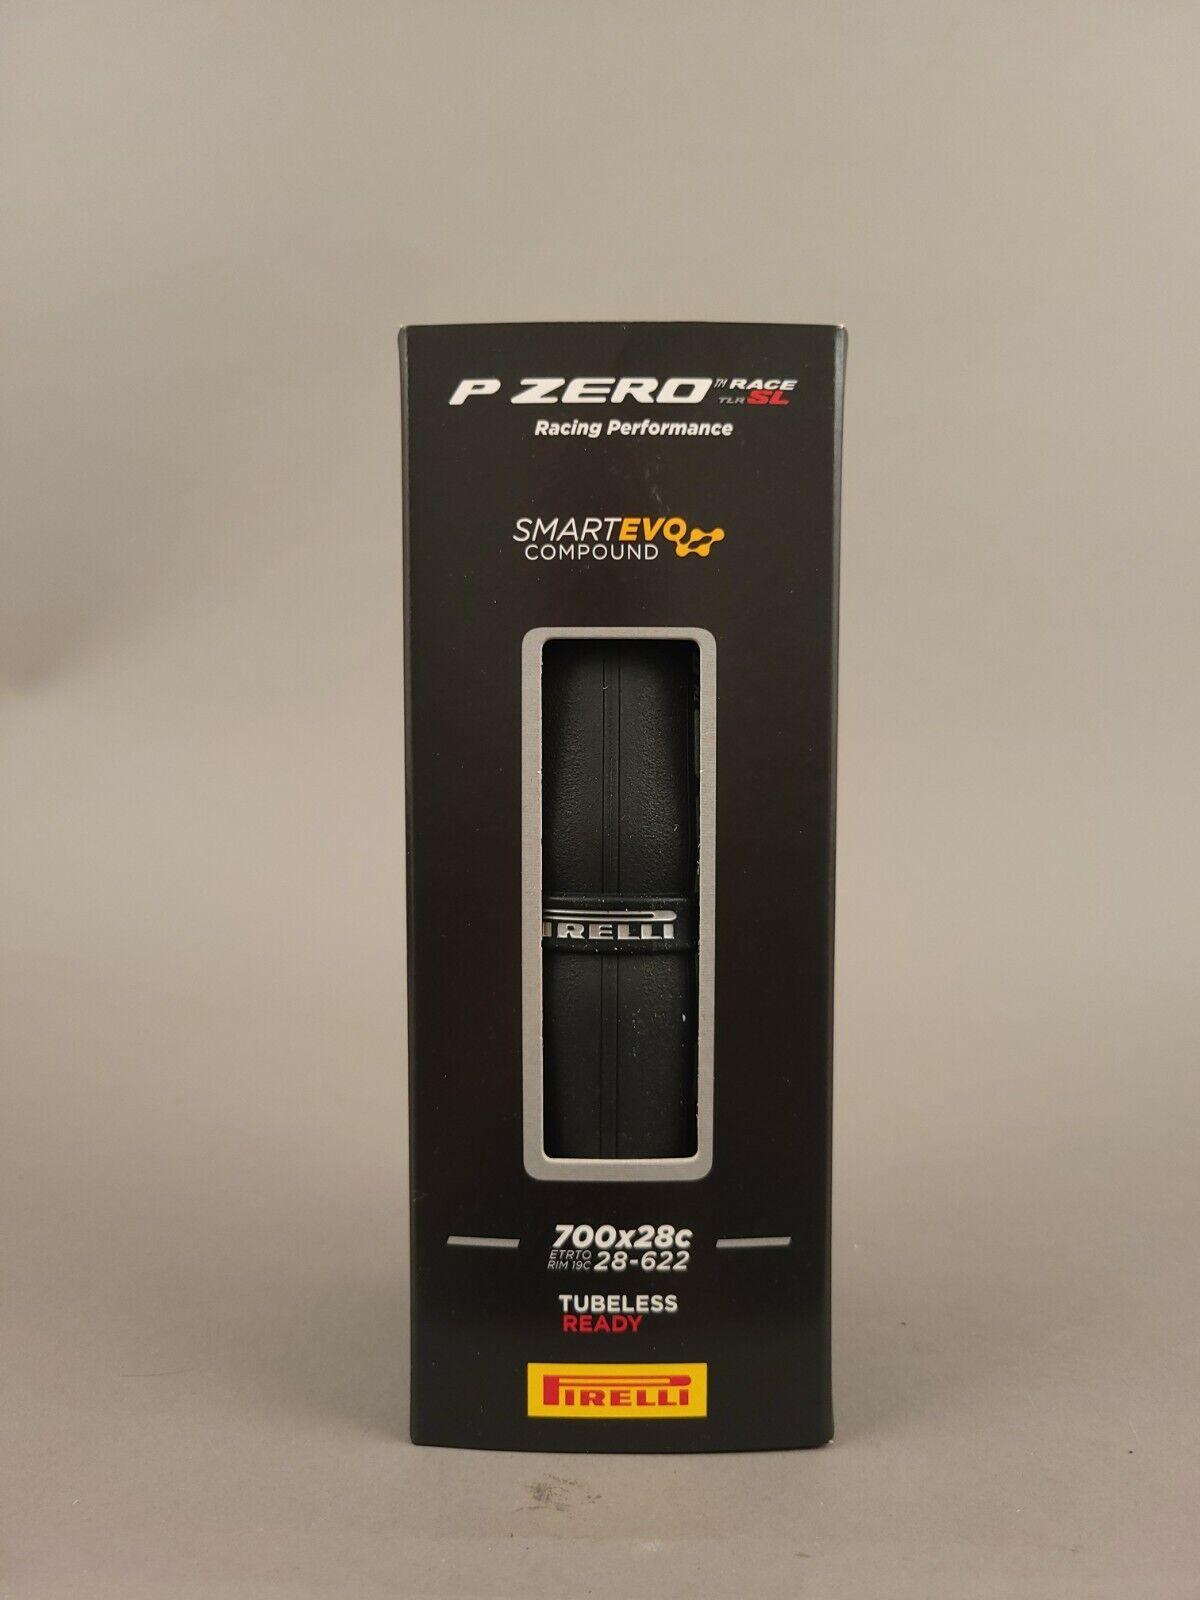 Image 1 - Pirelli P ZERO RACE TLR SL Road Bike Bicycle Tire - 700 x 28, Tubeless, Folding